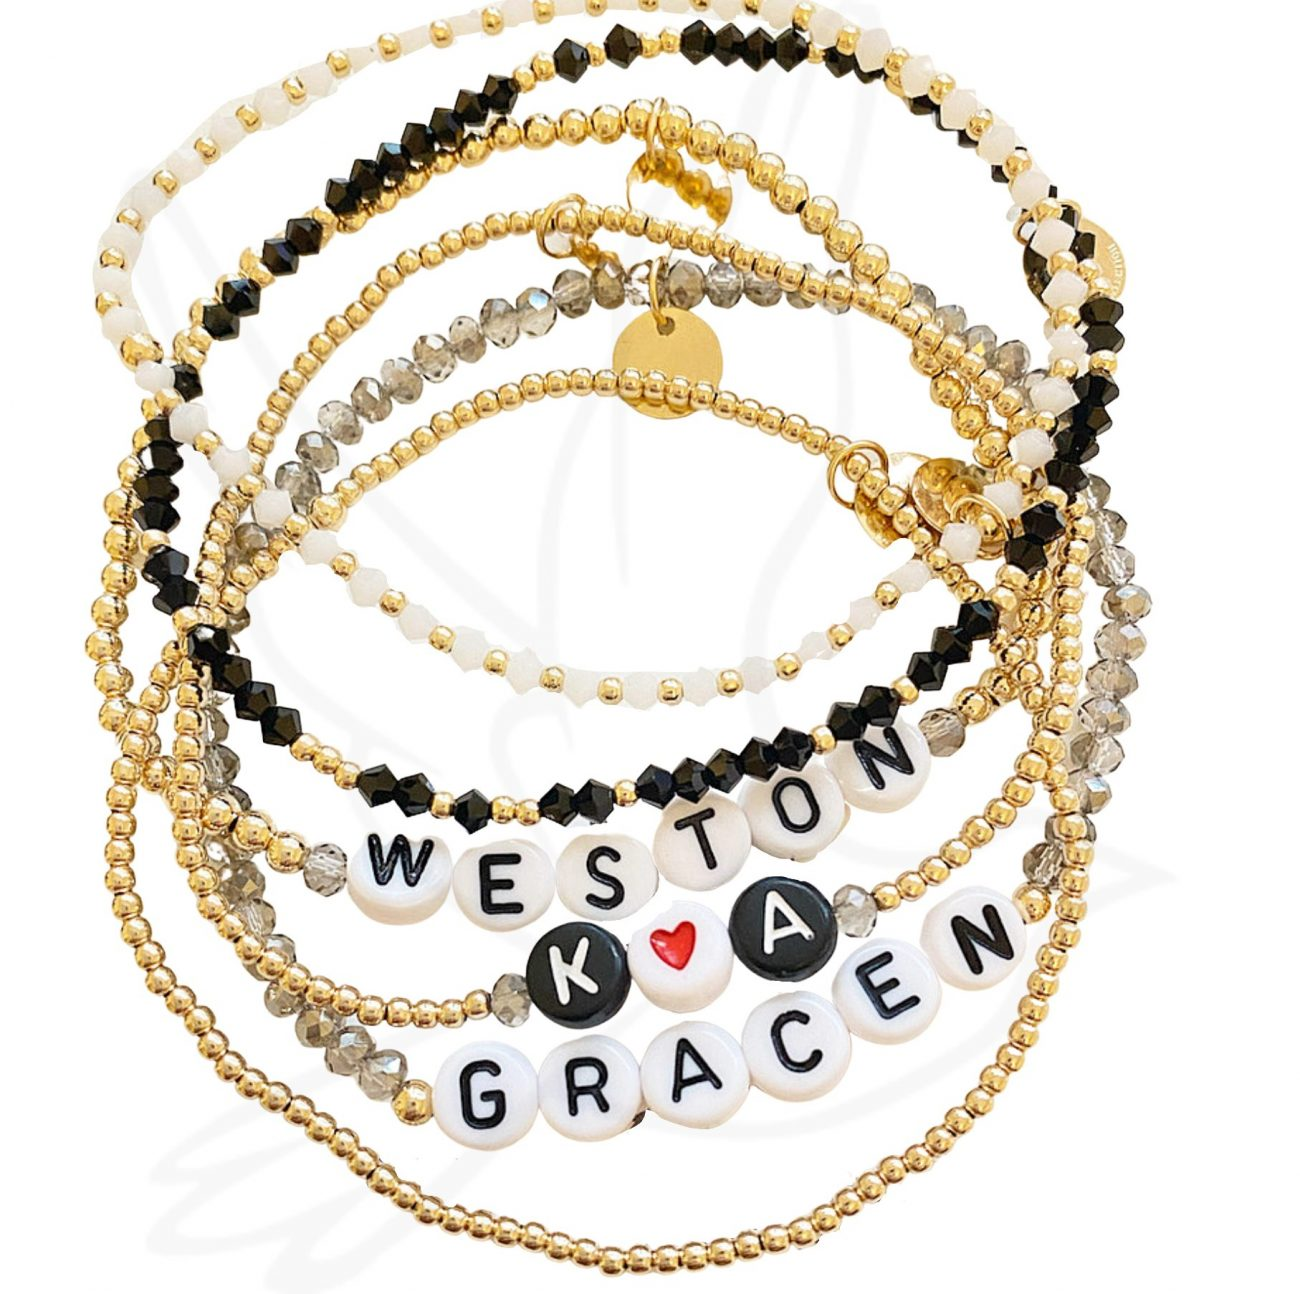 Customizable Wrist Reminders Bracelets